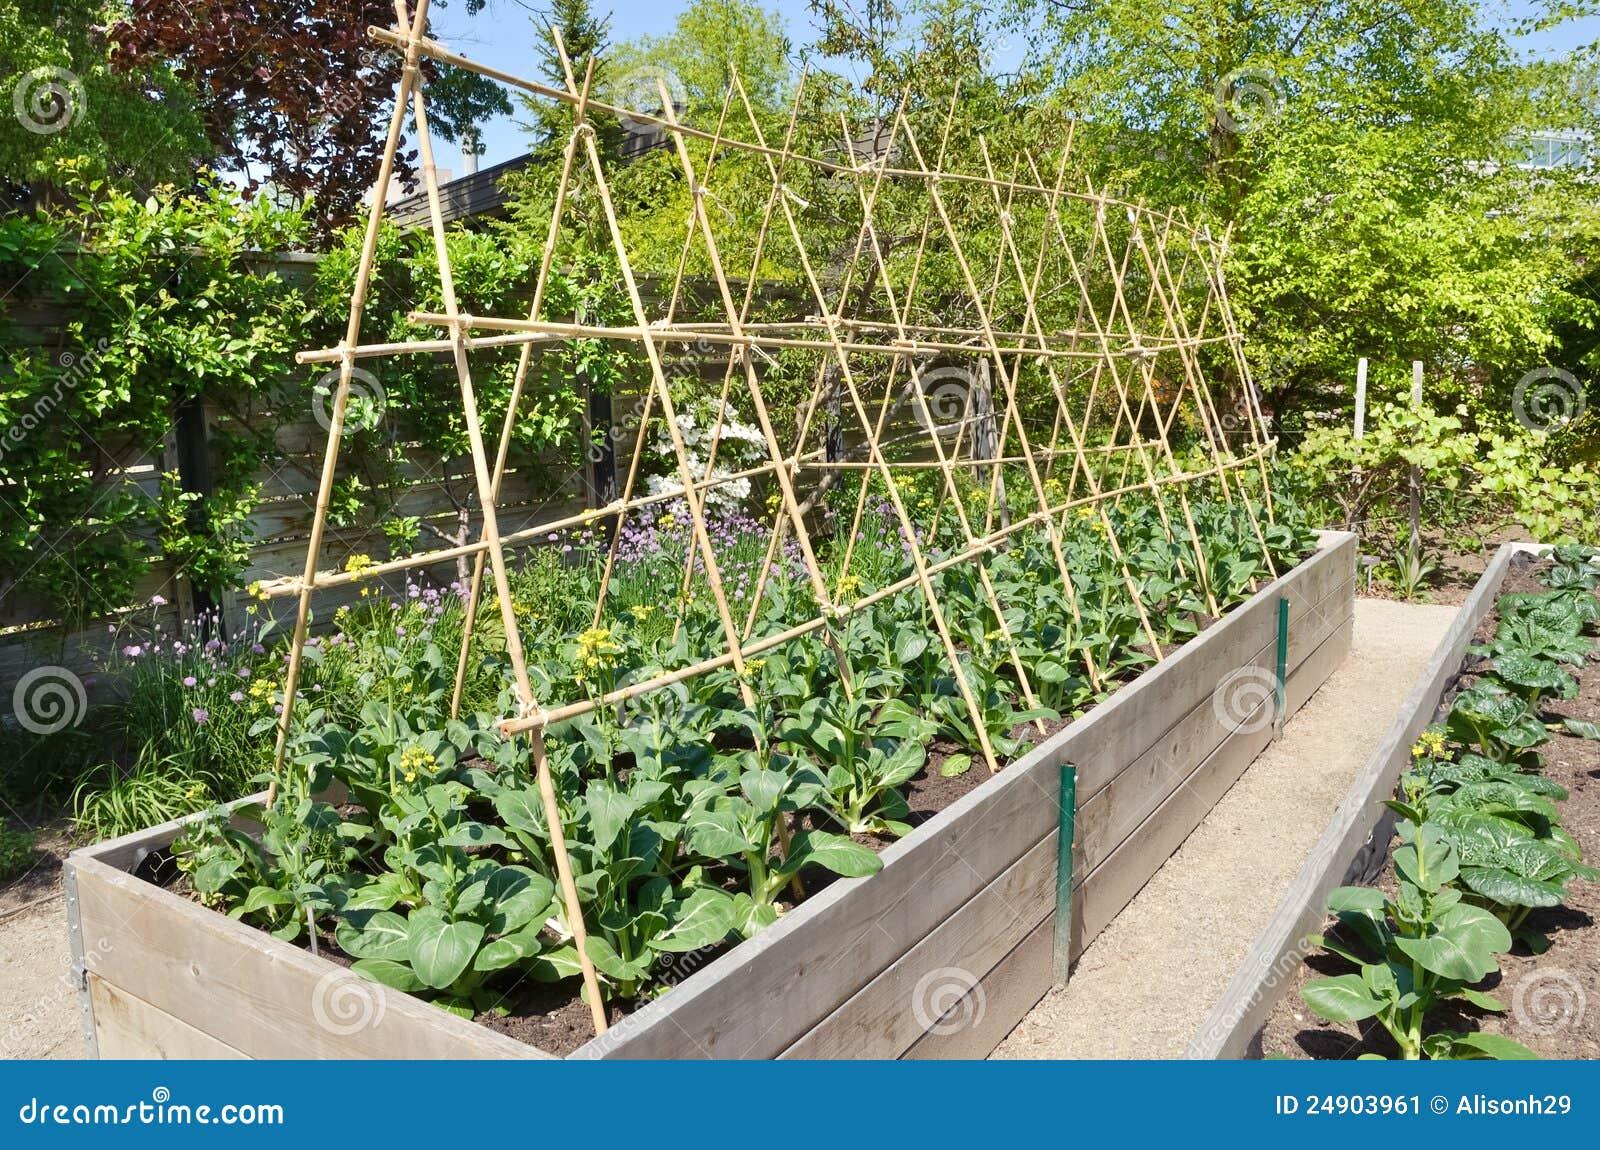 Kitchen Garden Stock Image - Image: 24903961